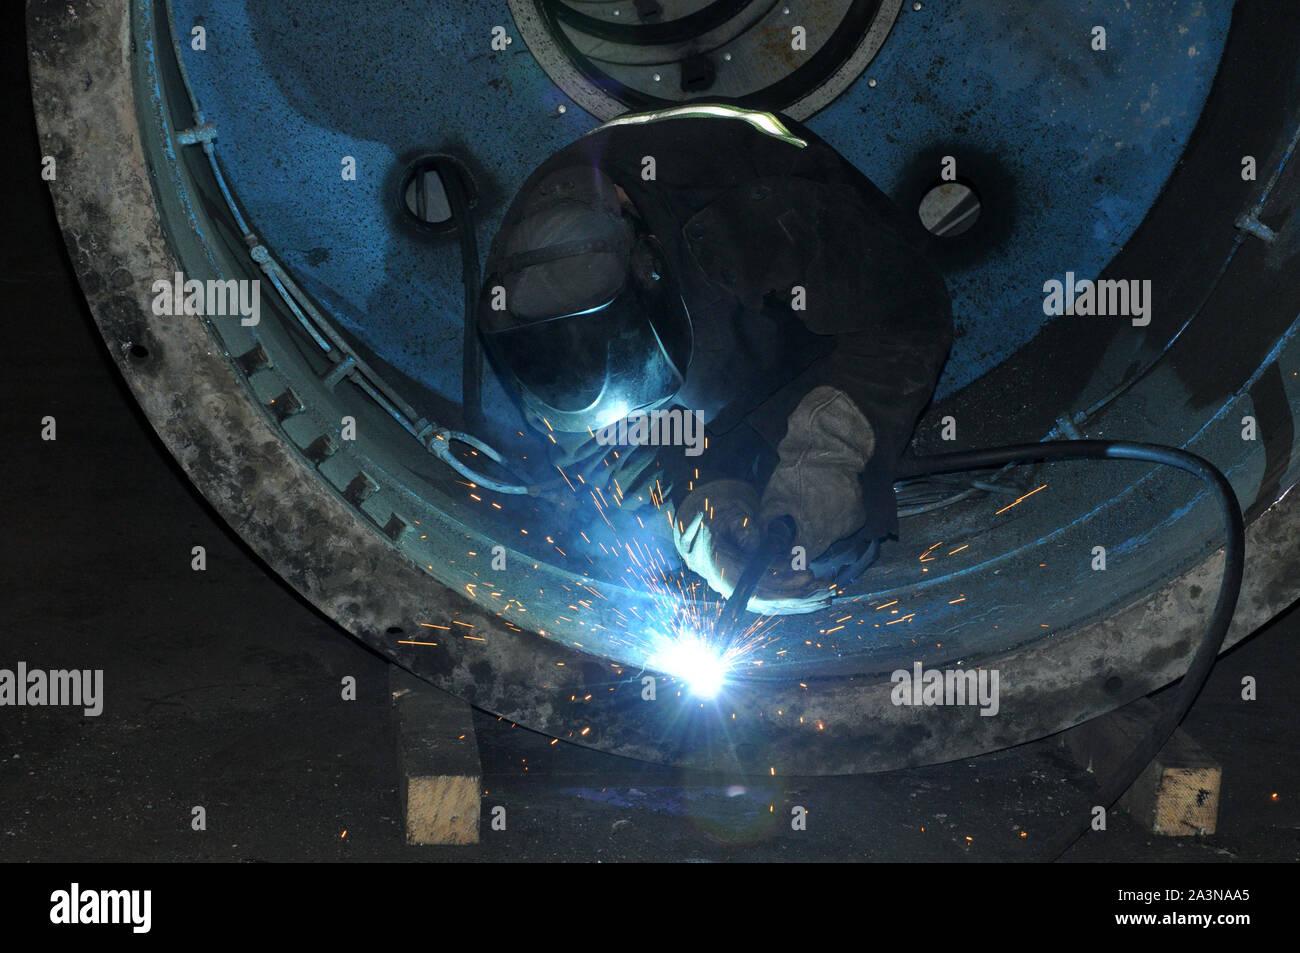 Professional welder welds an industrial tank in a workshop. Stock Photo